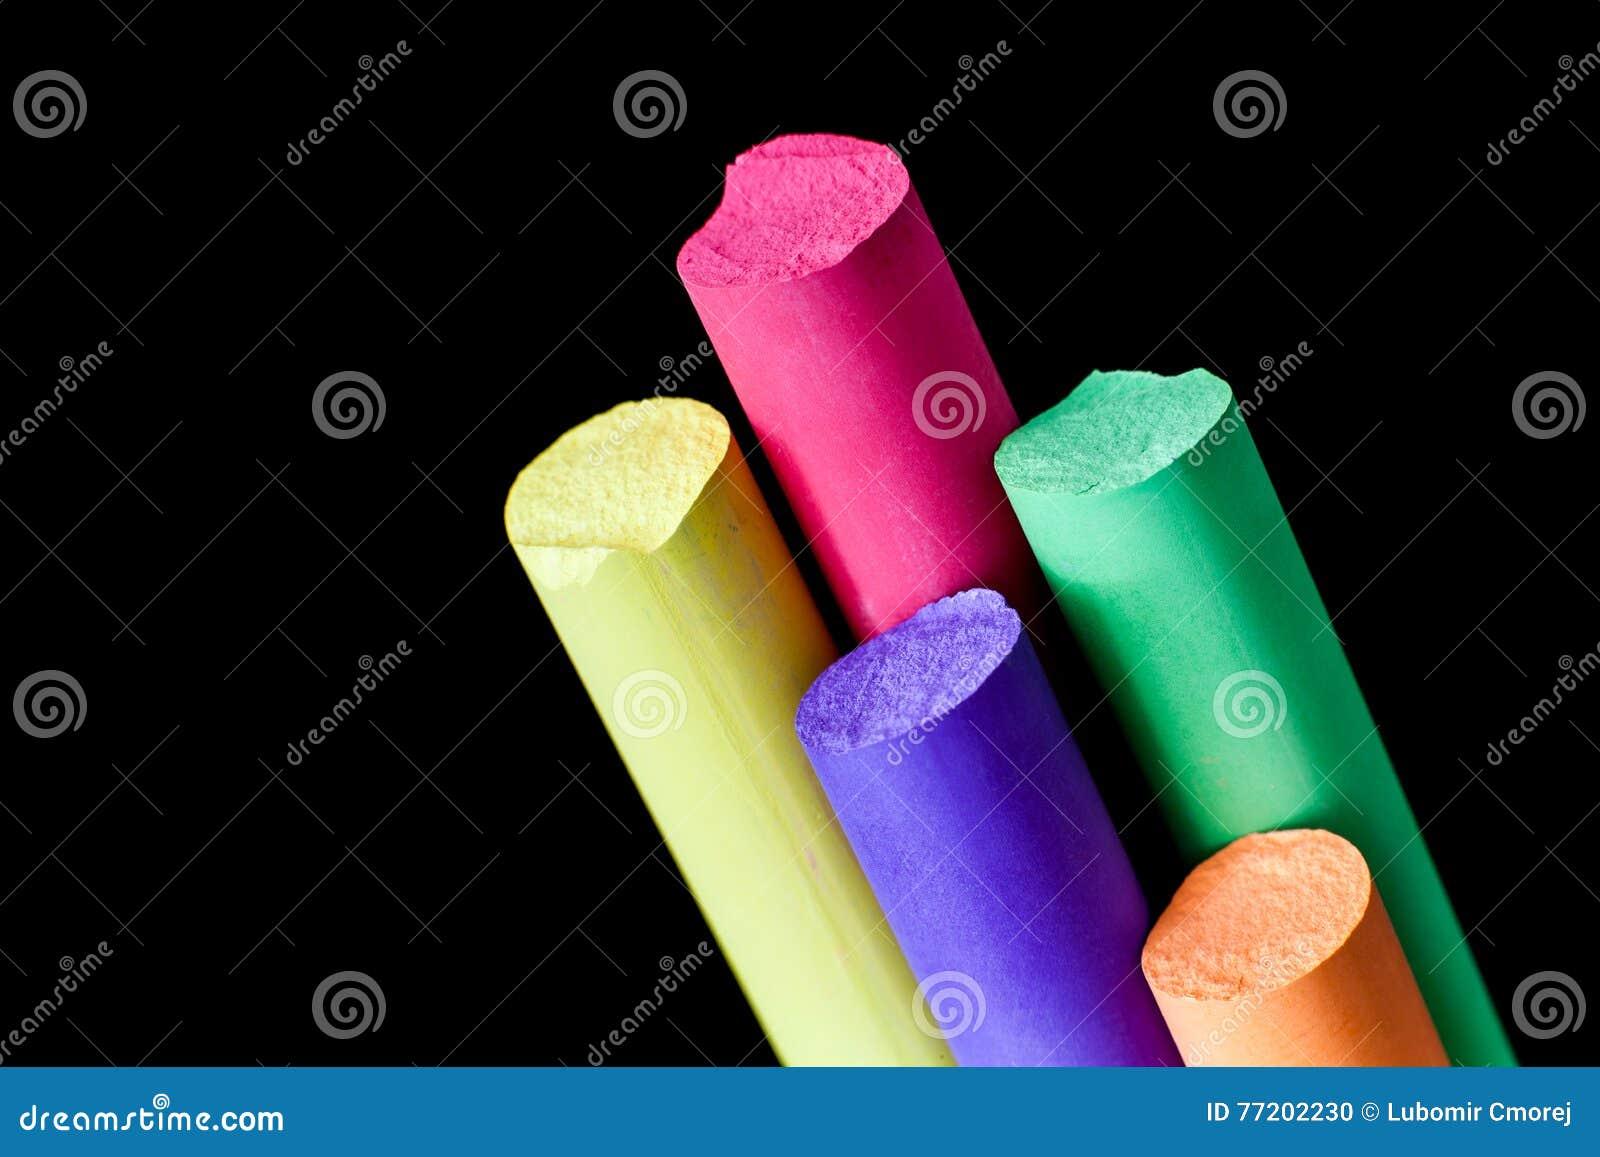 Five colore chalks on a black